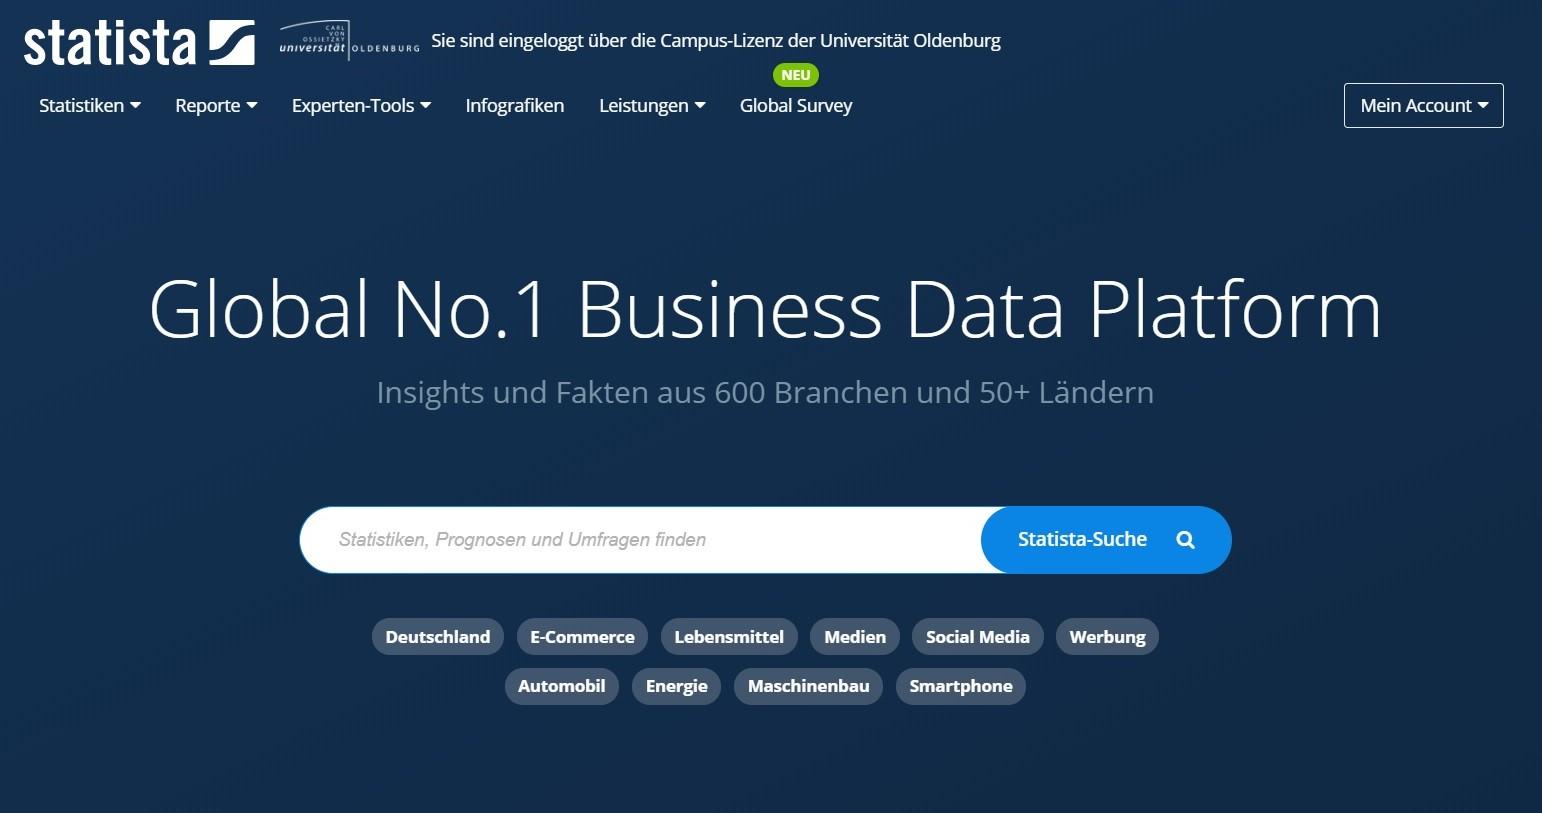 Landing Page Statista Business Data Platform